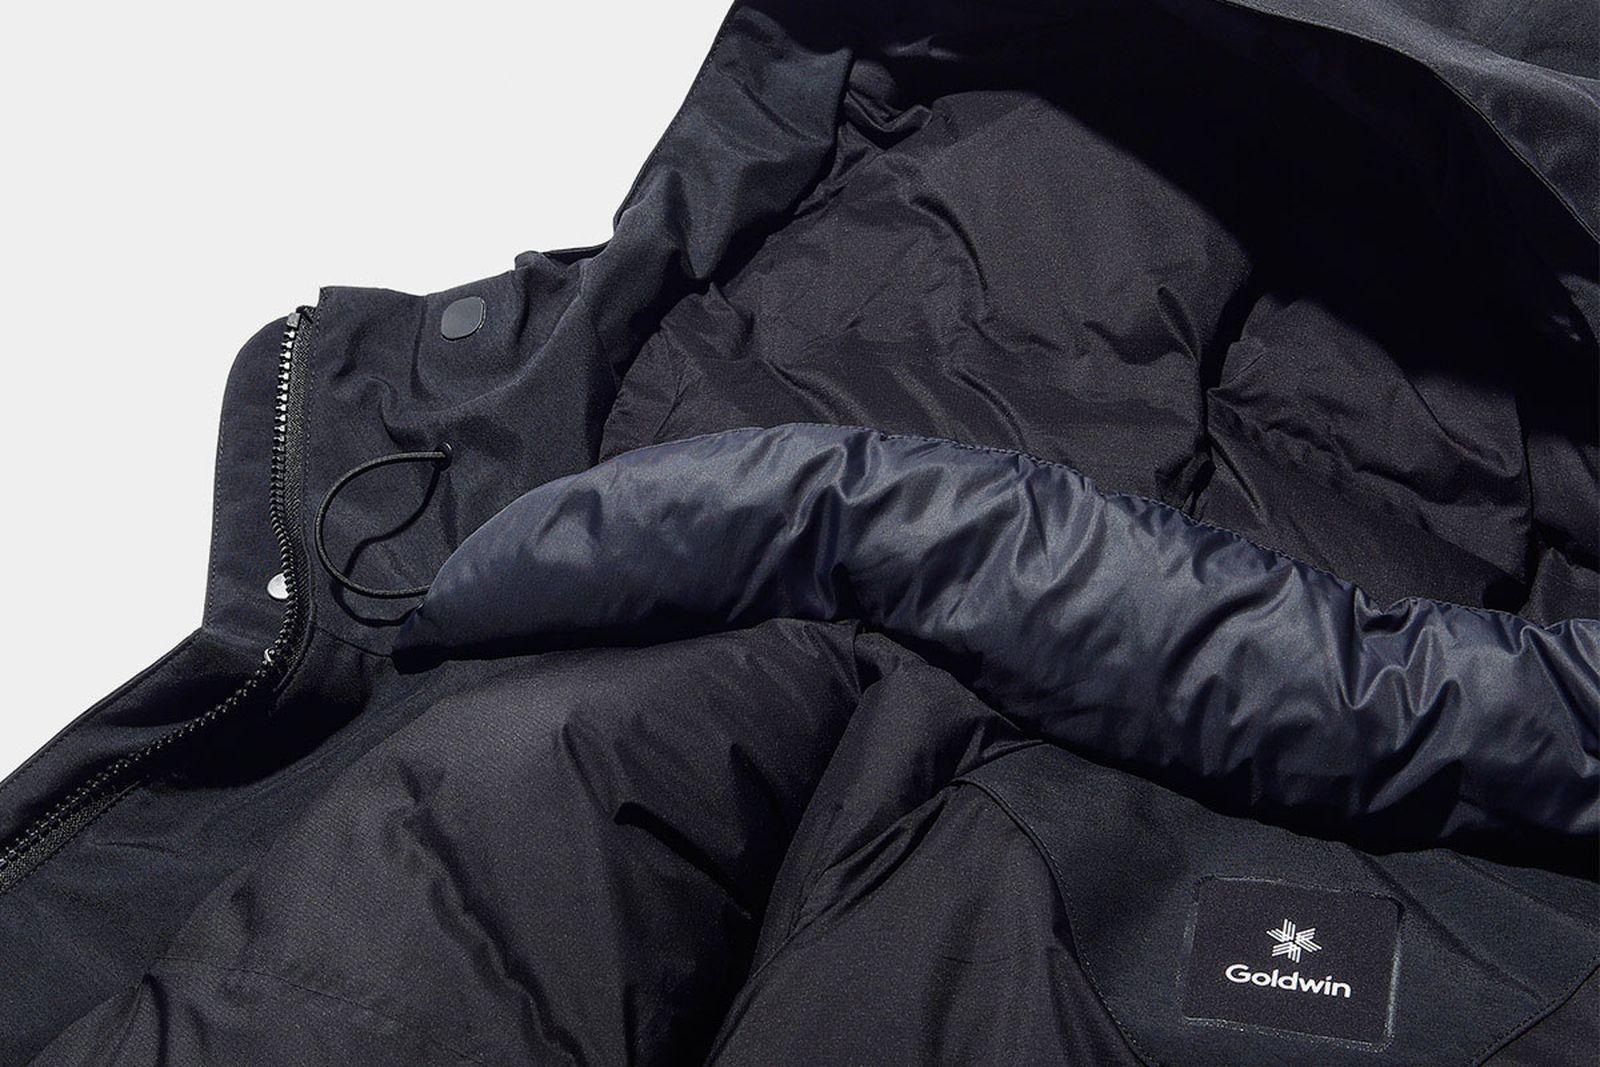 japanese-outerwear-goldwin-san-francisco-lifestyle-5